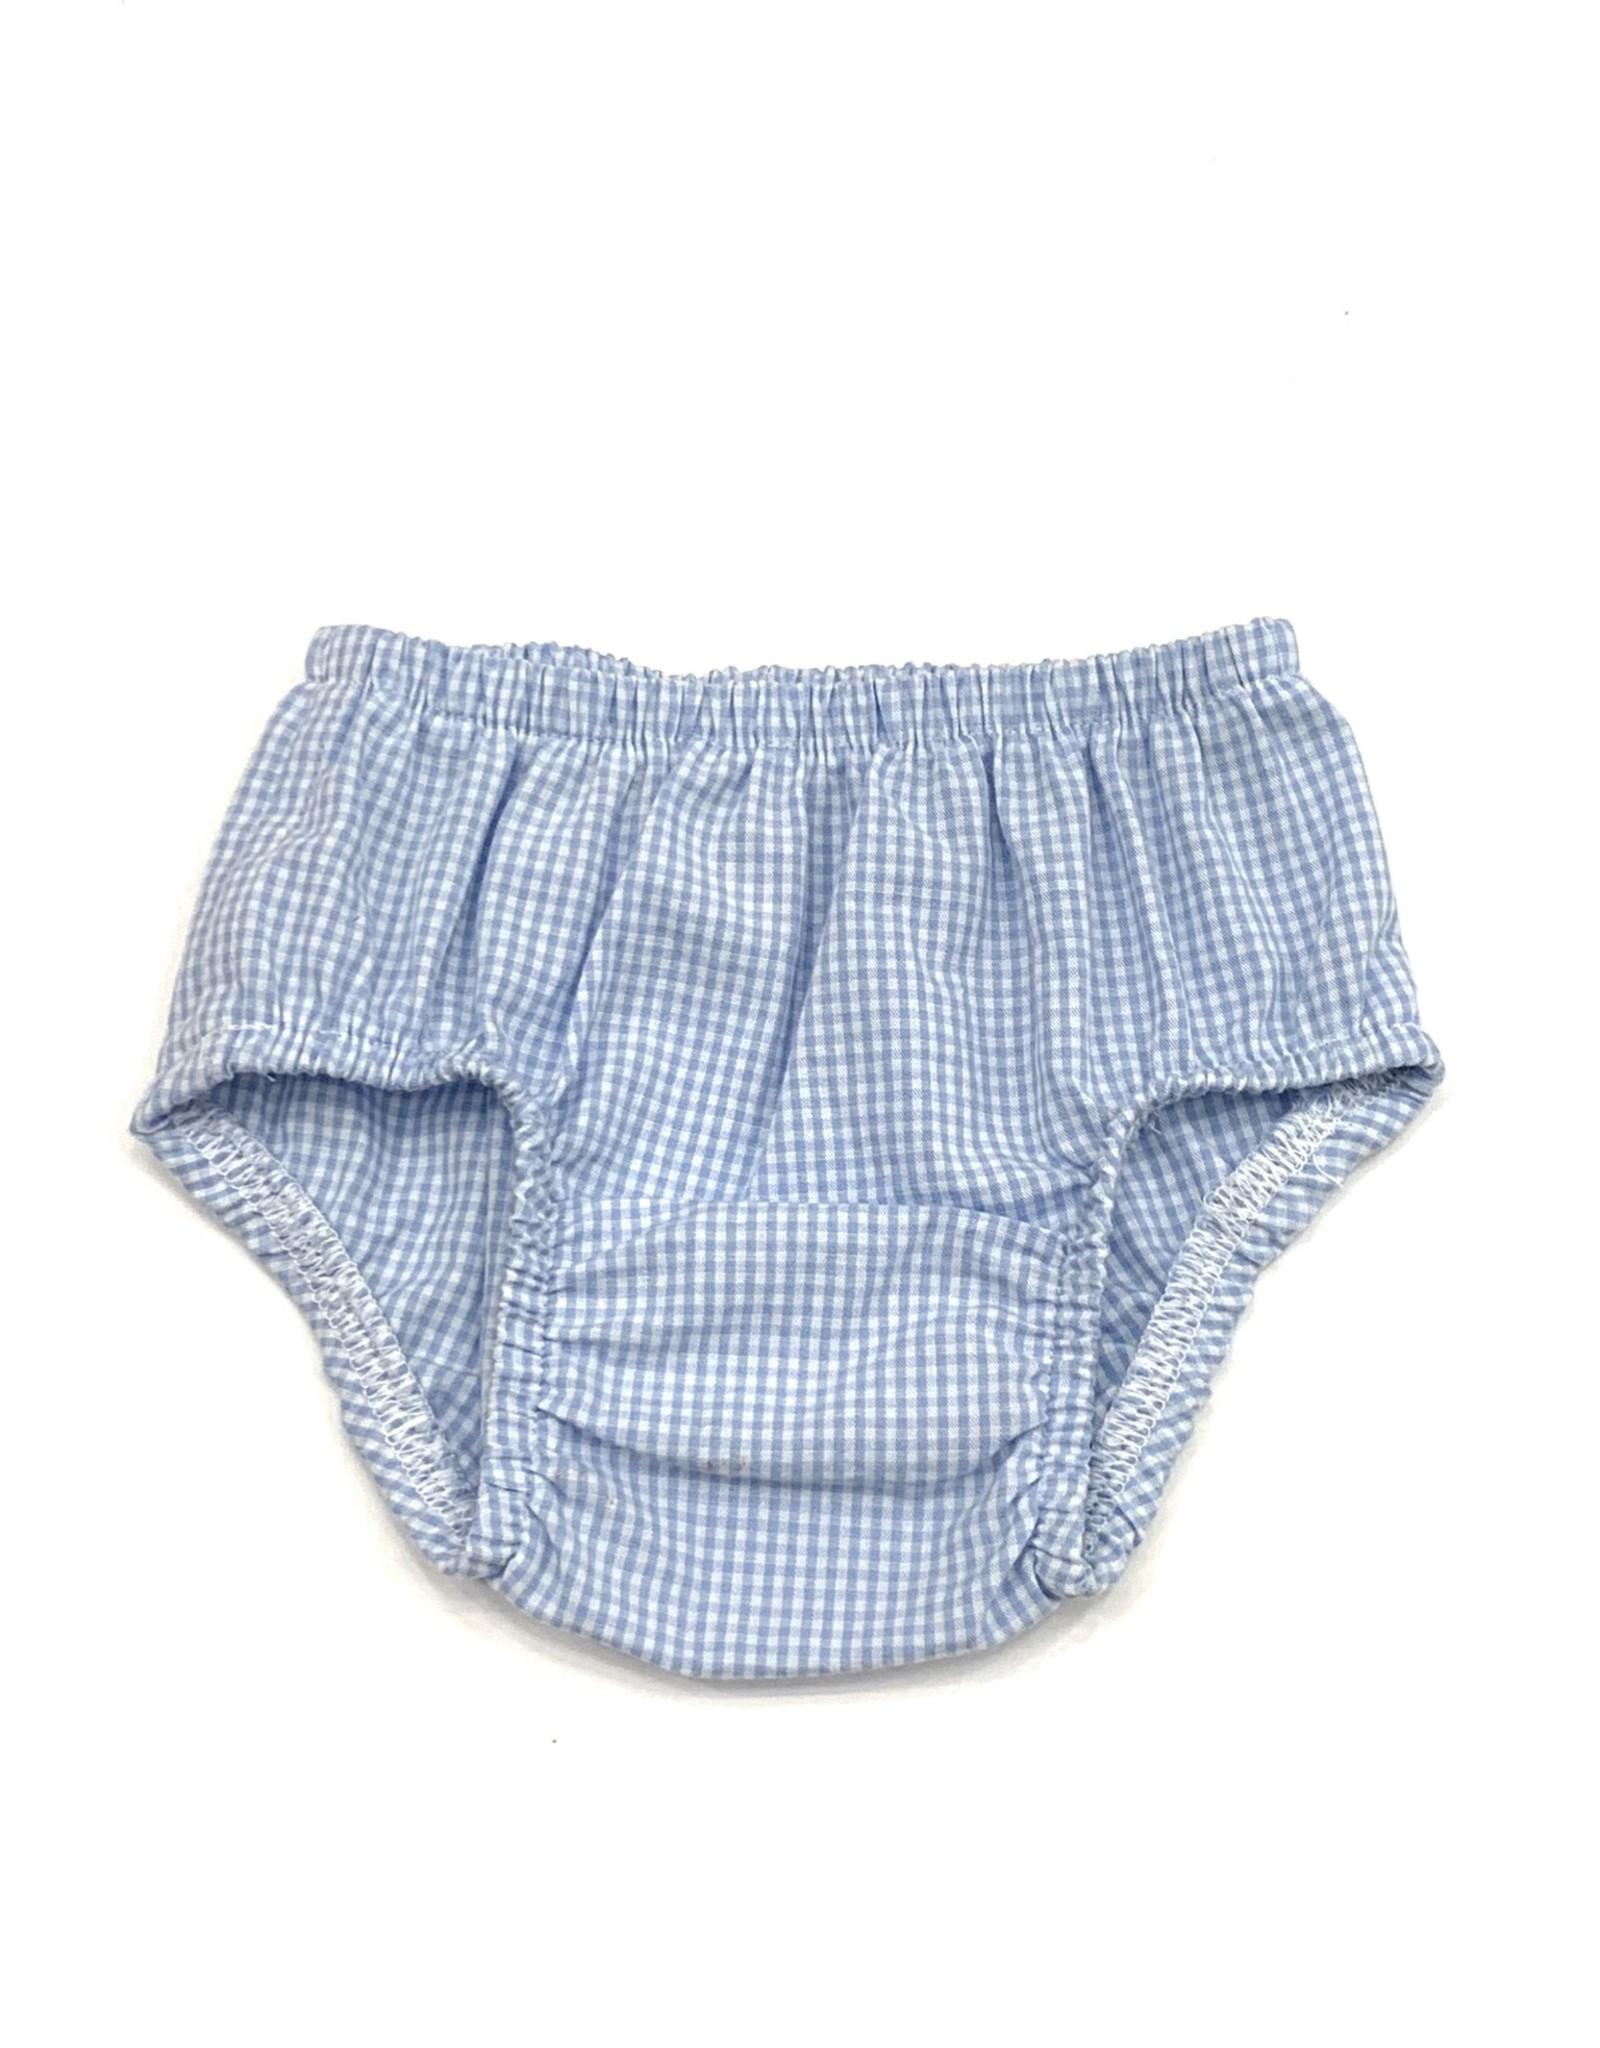 Funstyle Newborn Diaper Cover Blue